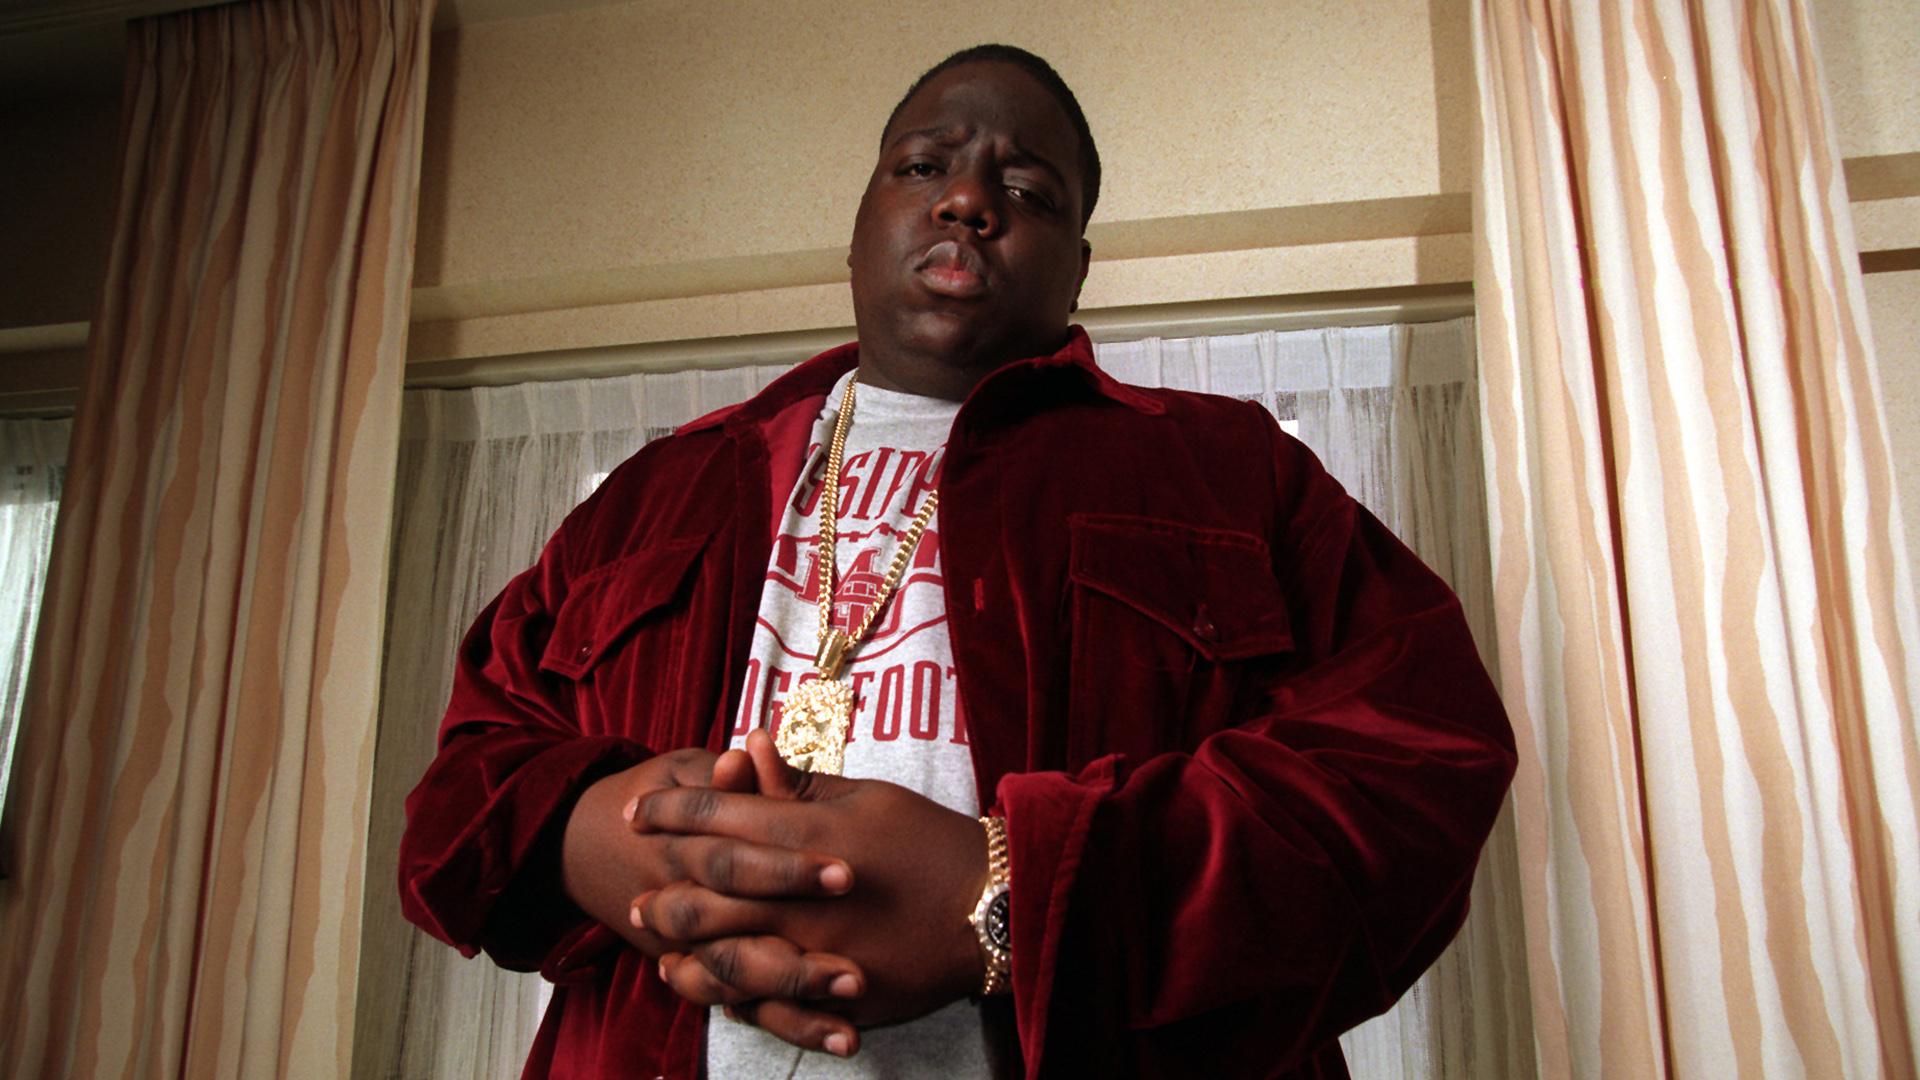 The Notorious B.I.G. – Bastard Child